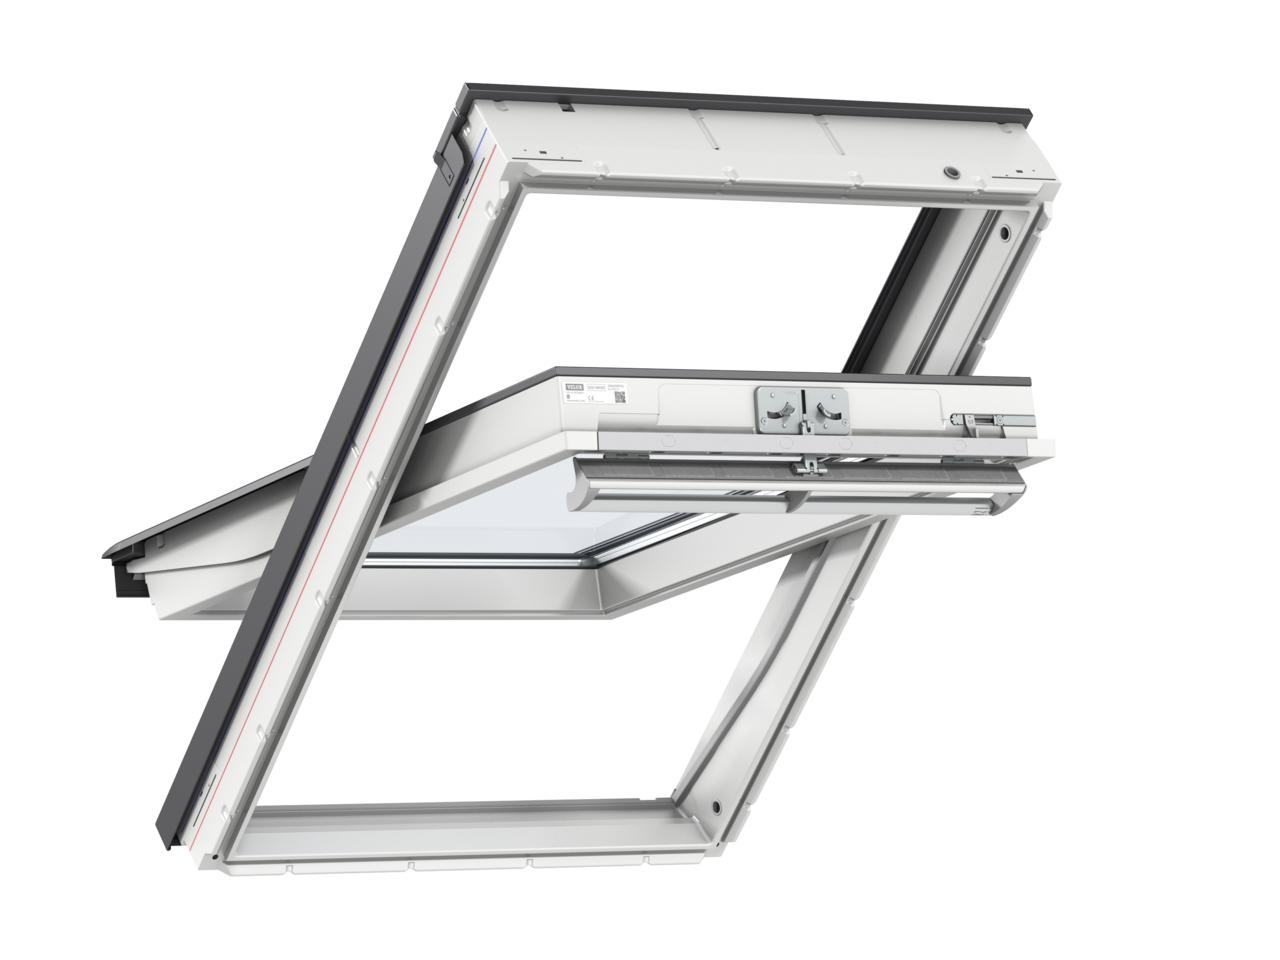 Velux GGU PK08 940 x 1400mm Centre Pivot 66Pane Roof Window - White Polyurethane